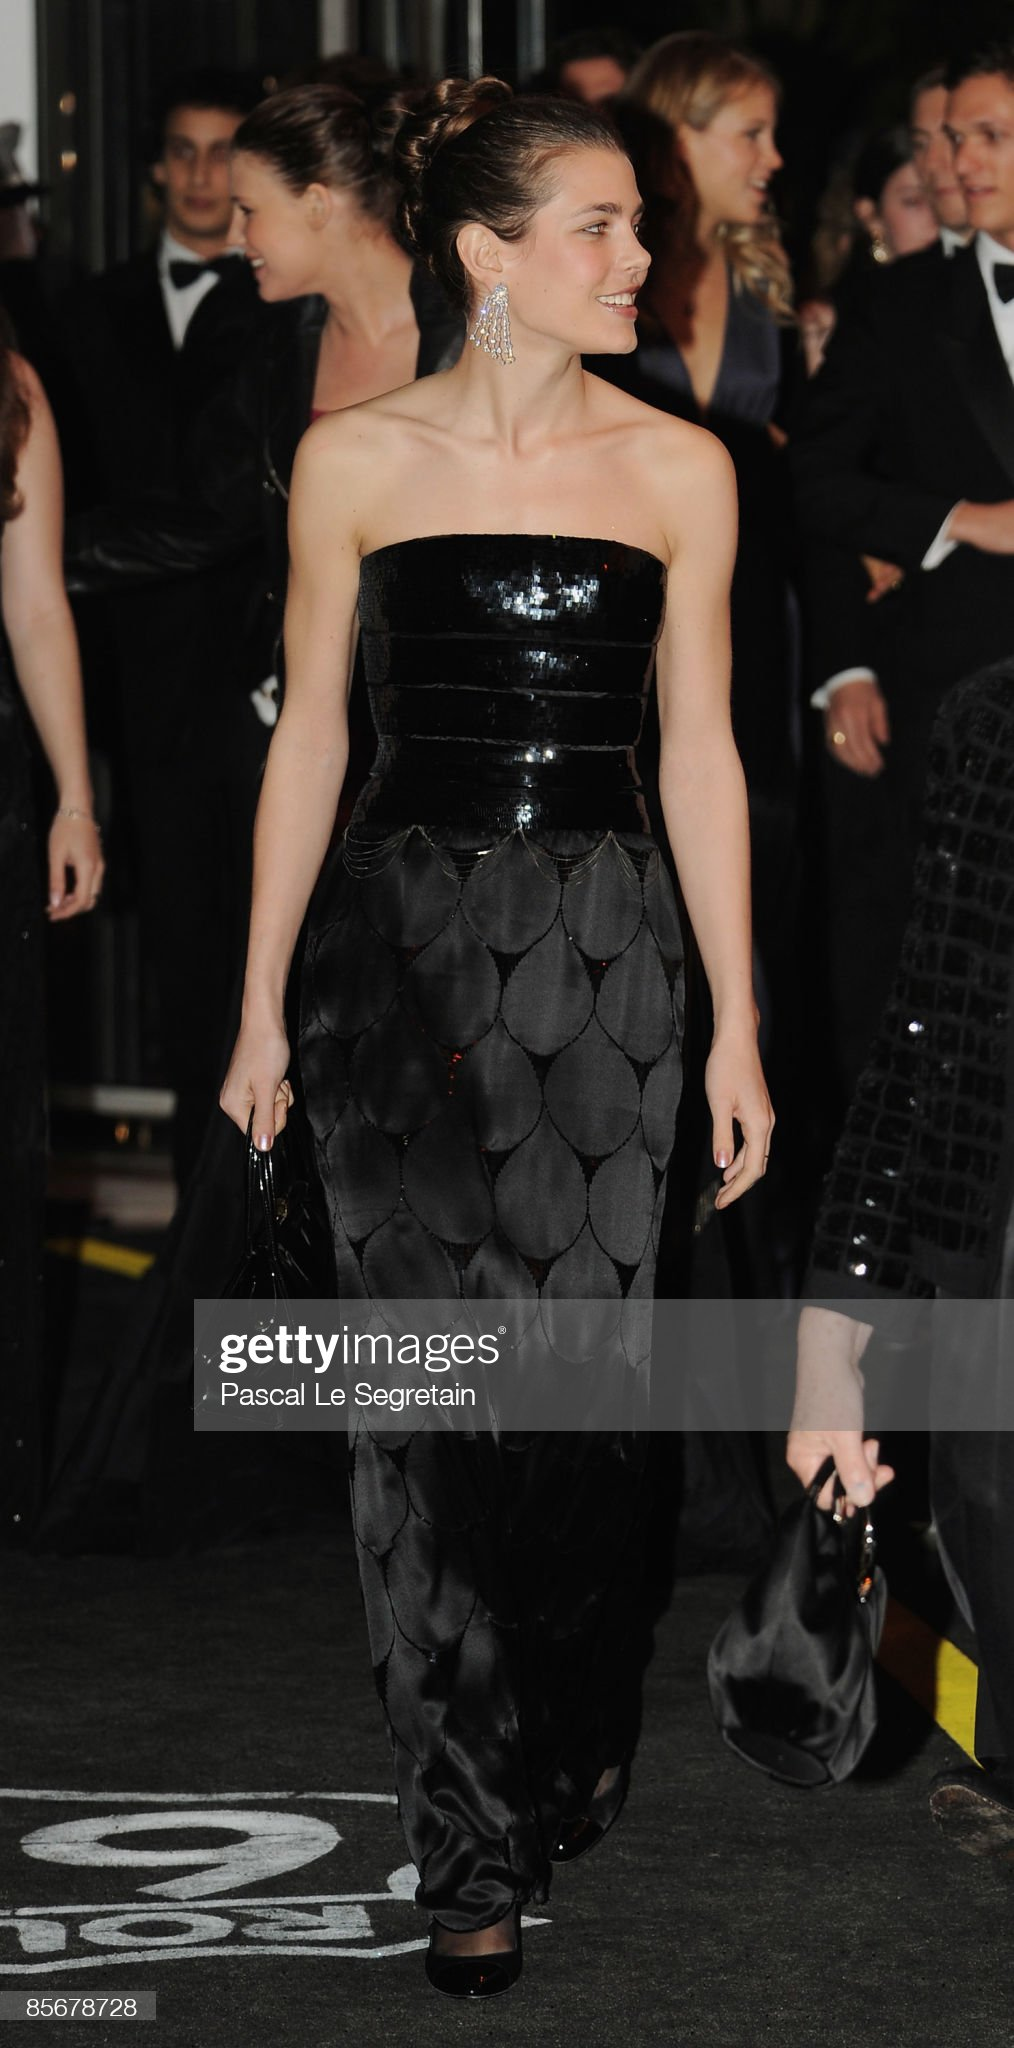 2009 Monte Carlo Rose Ball : News Photo